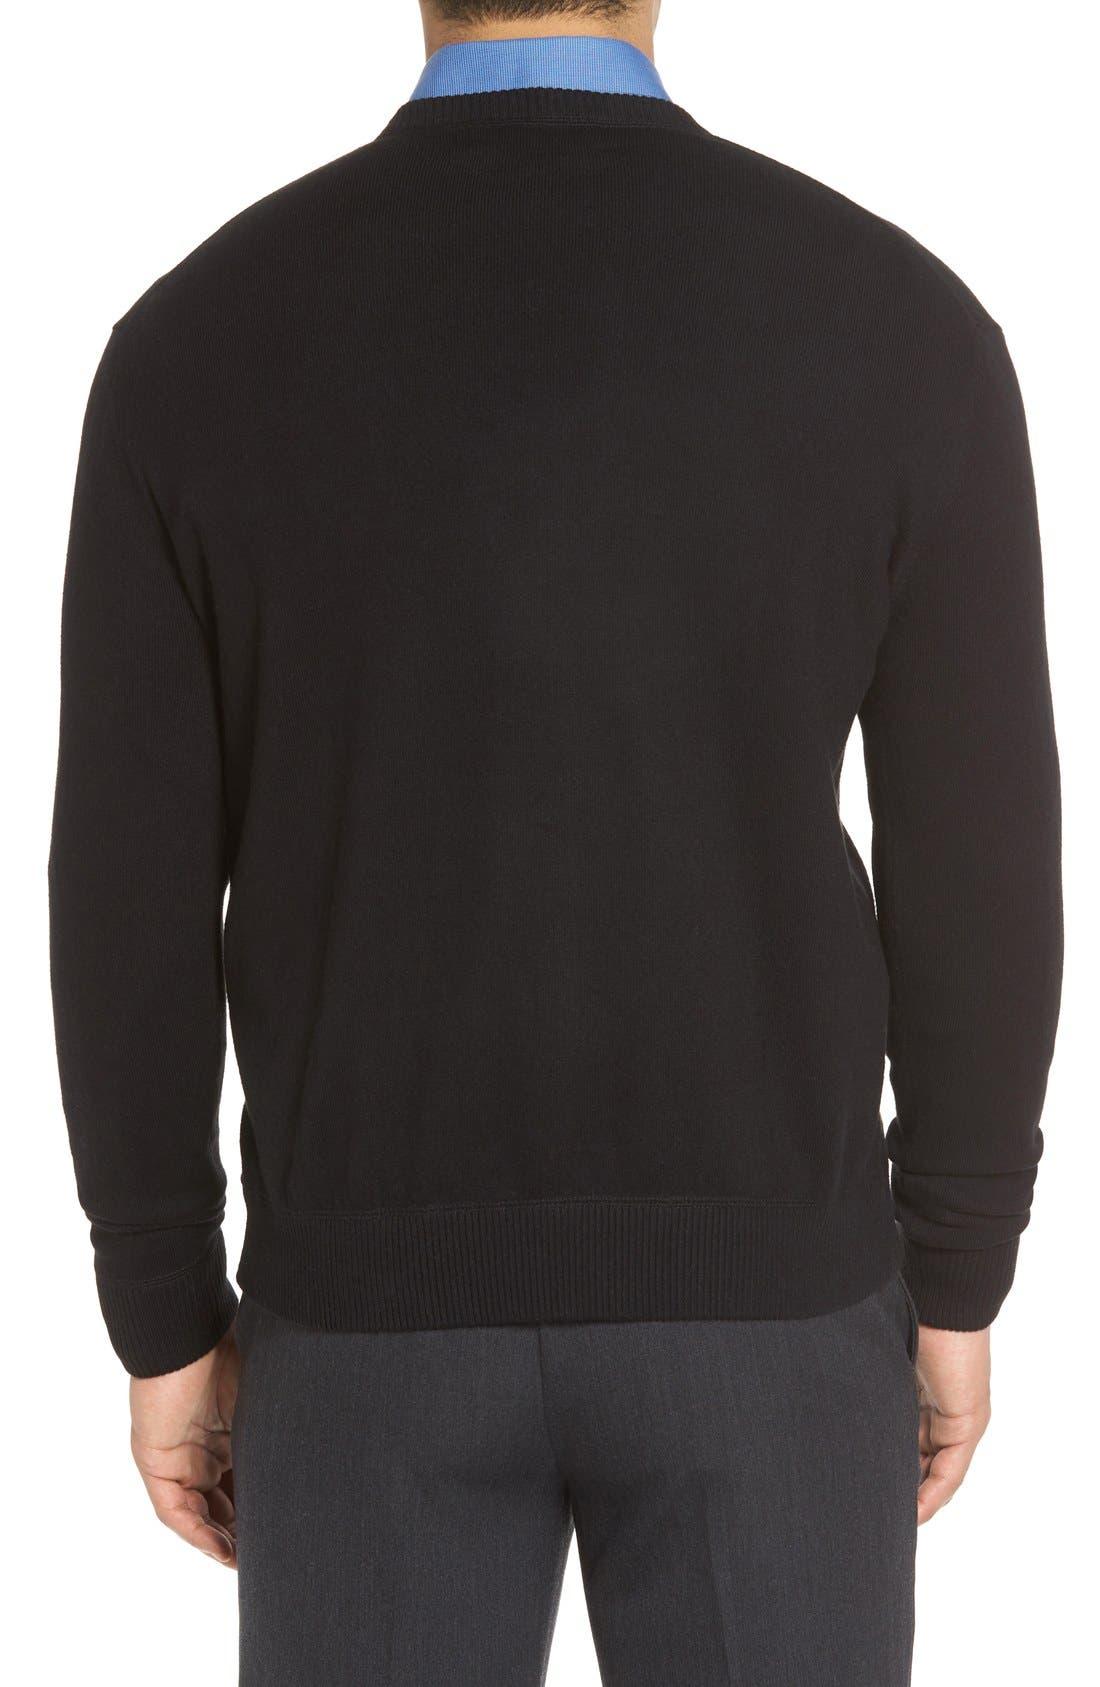 'Jersey Sport' Cotton Blend Crewneck Sweater,                             Alternate thumbnail 2, color,                             001